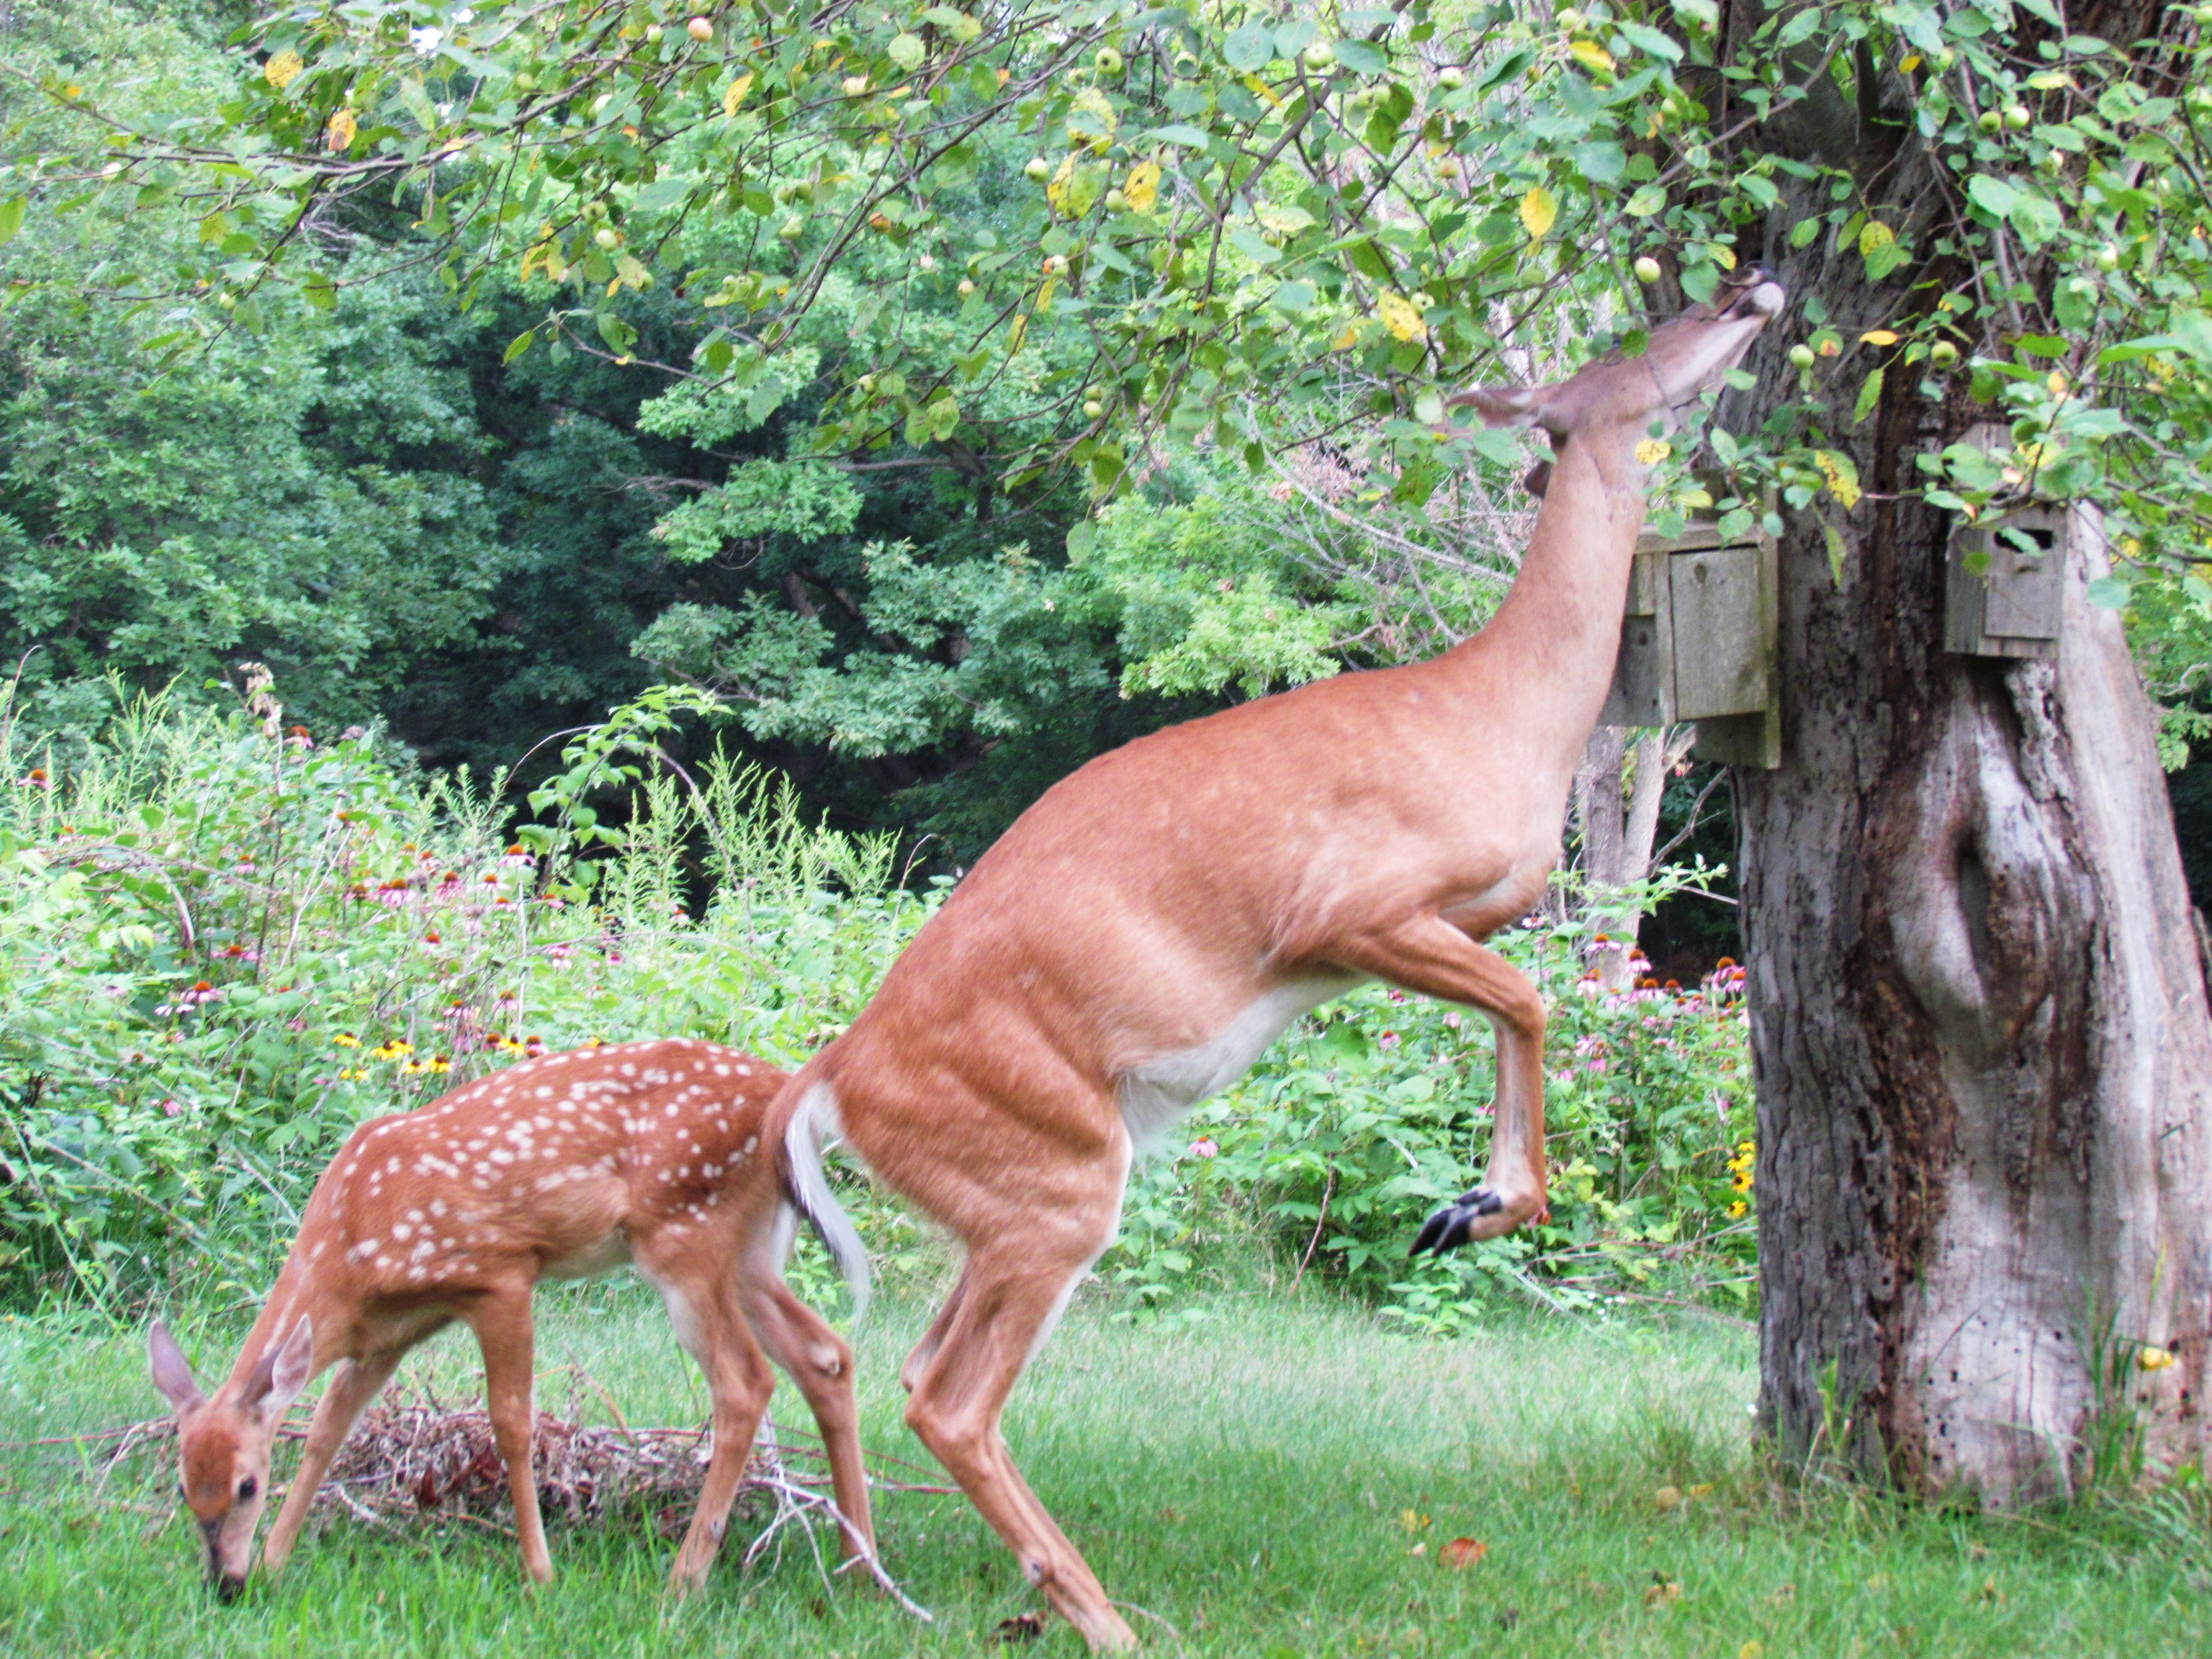 doe picking apples